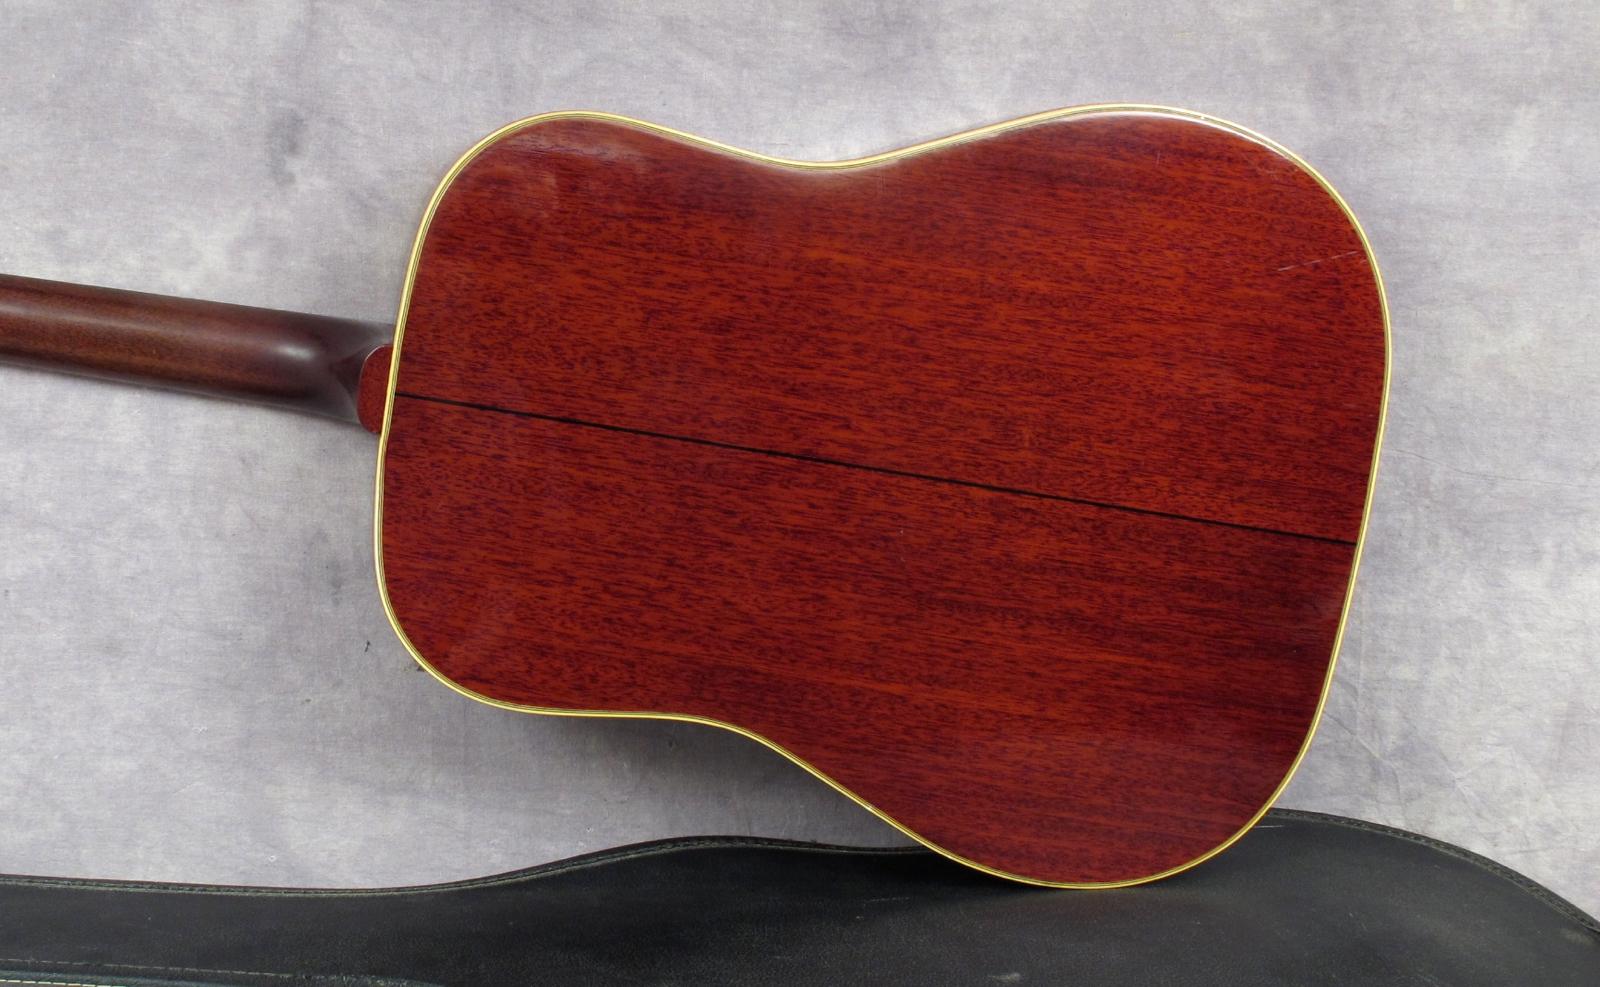 gibson southern jumbo 1964 sunburst guitar for sale andy baxter bass guitars ltd. Black Bedroom Furniture Sets. Home Design Ideas